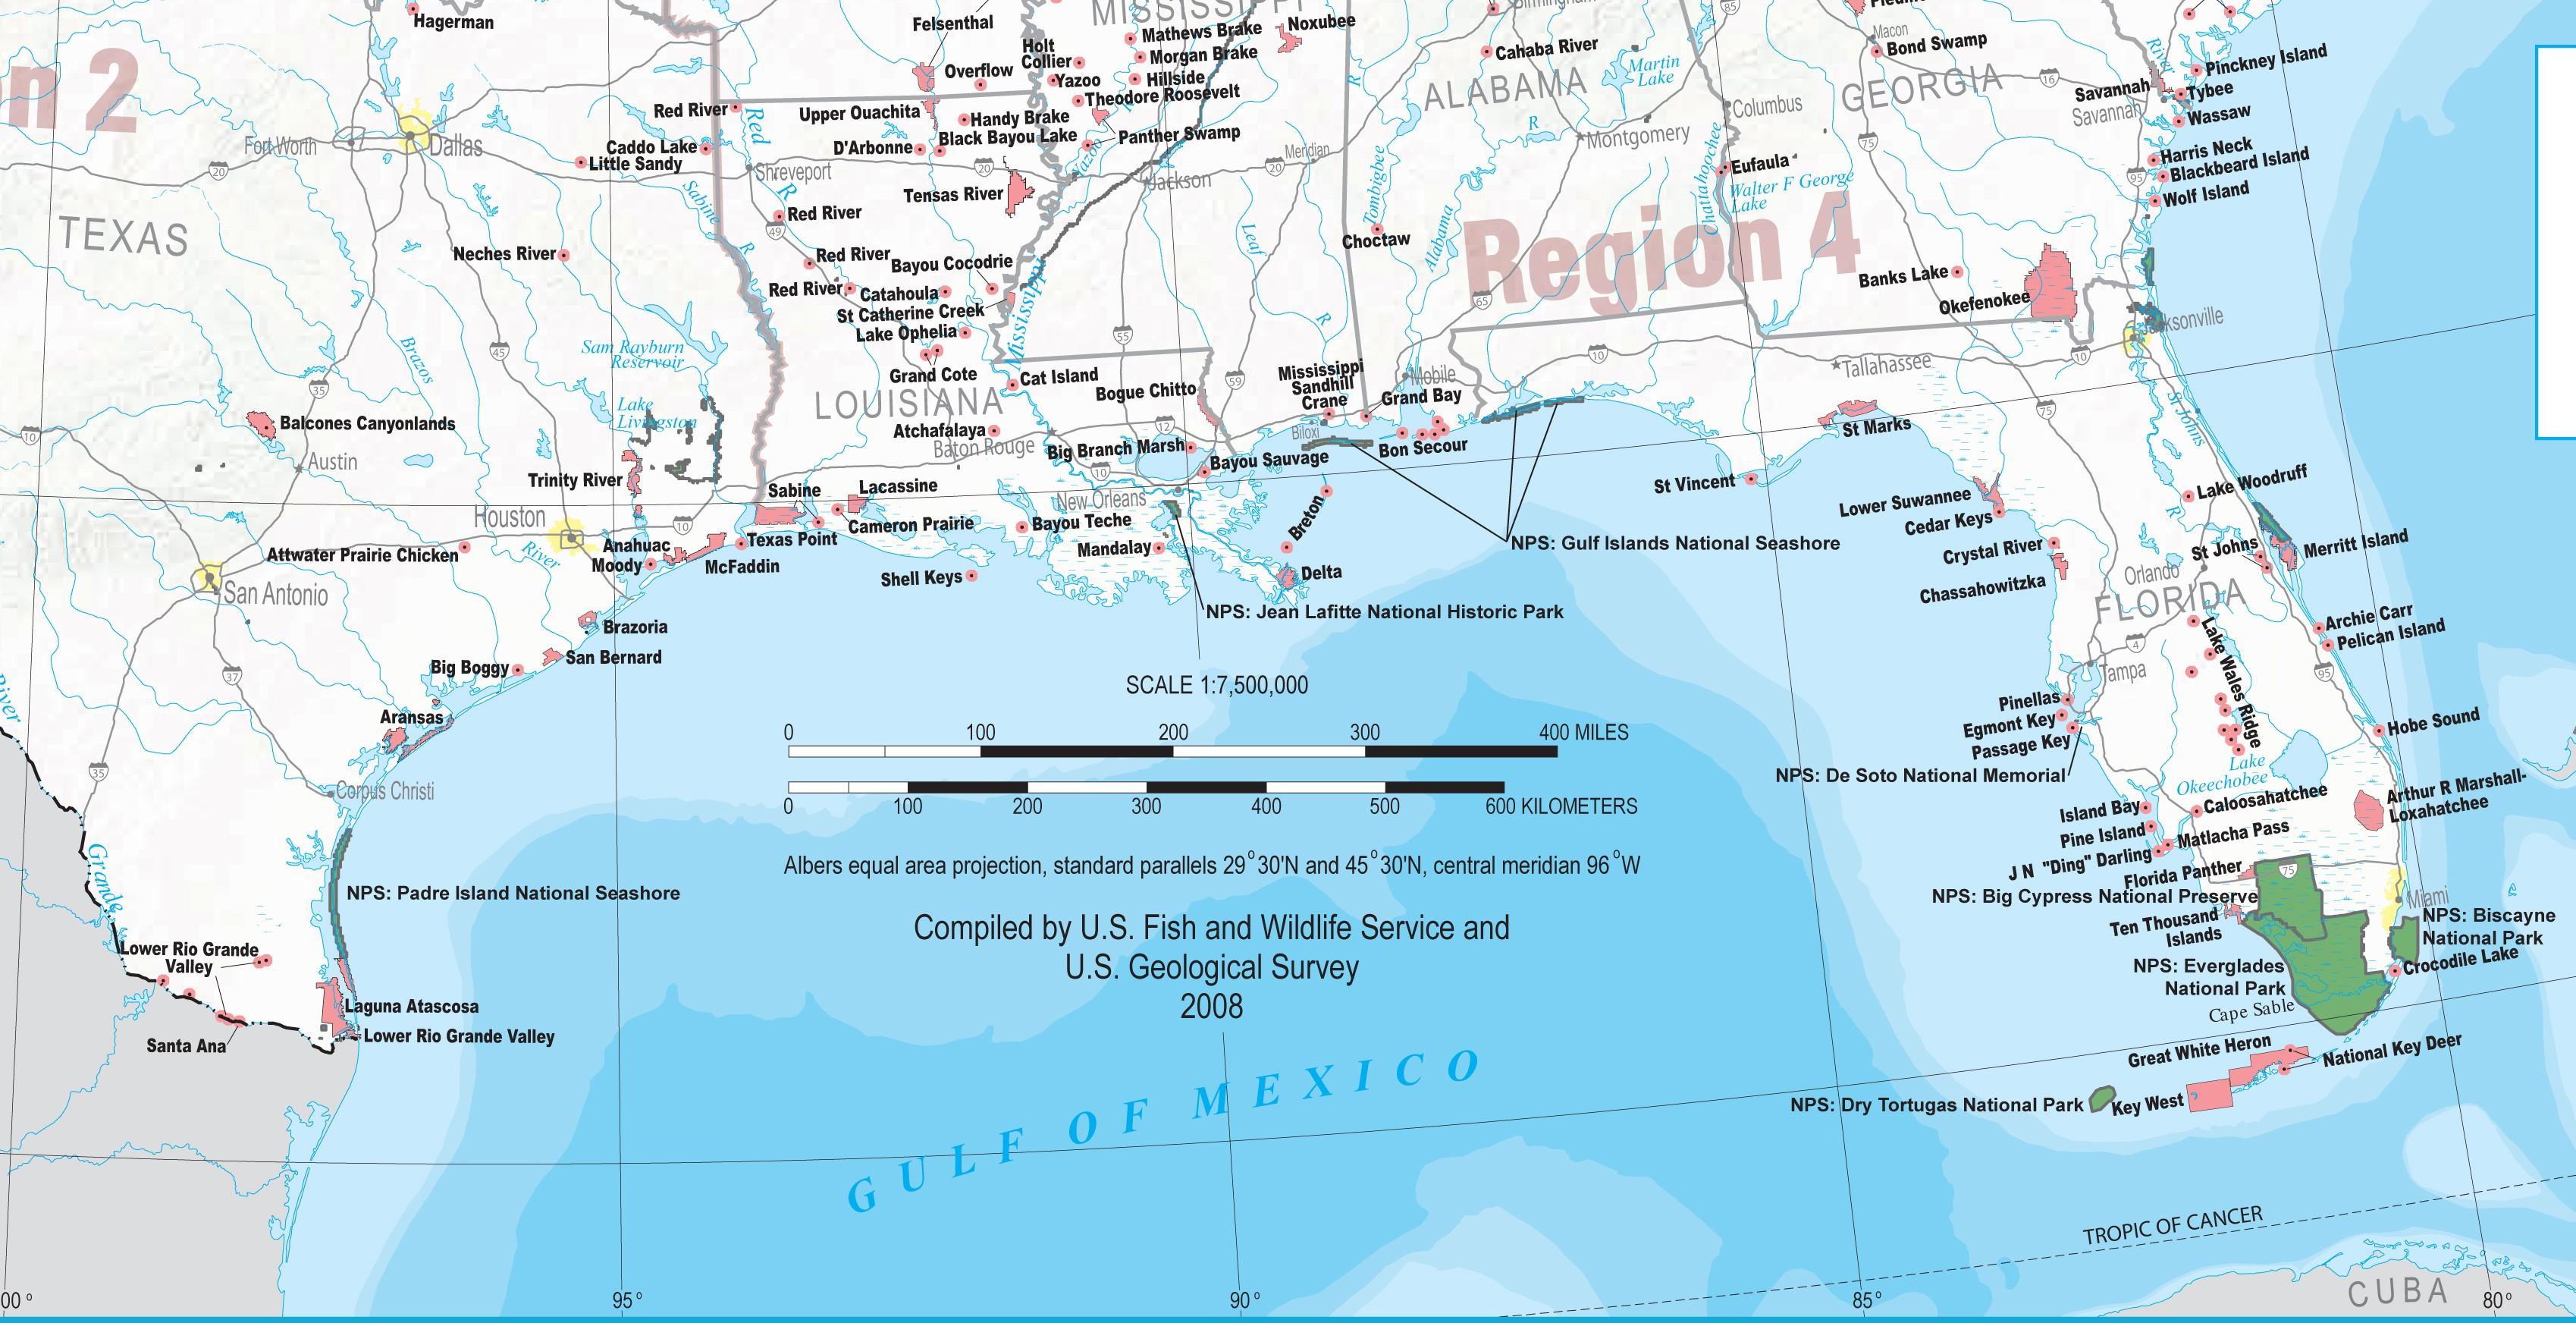 Map Of Gulf Coast Cities   Sitedesignco - Gulf Coast Cities In Florida Map